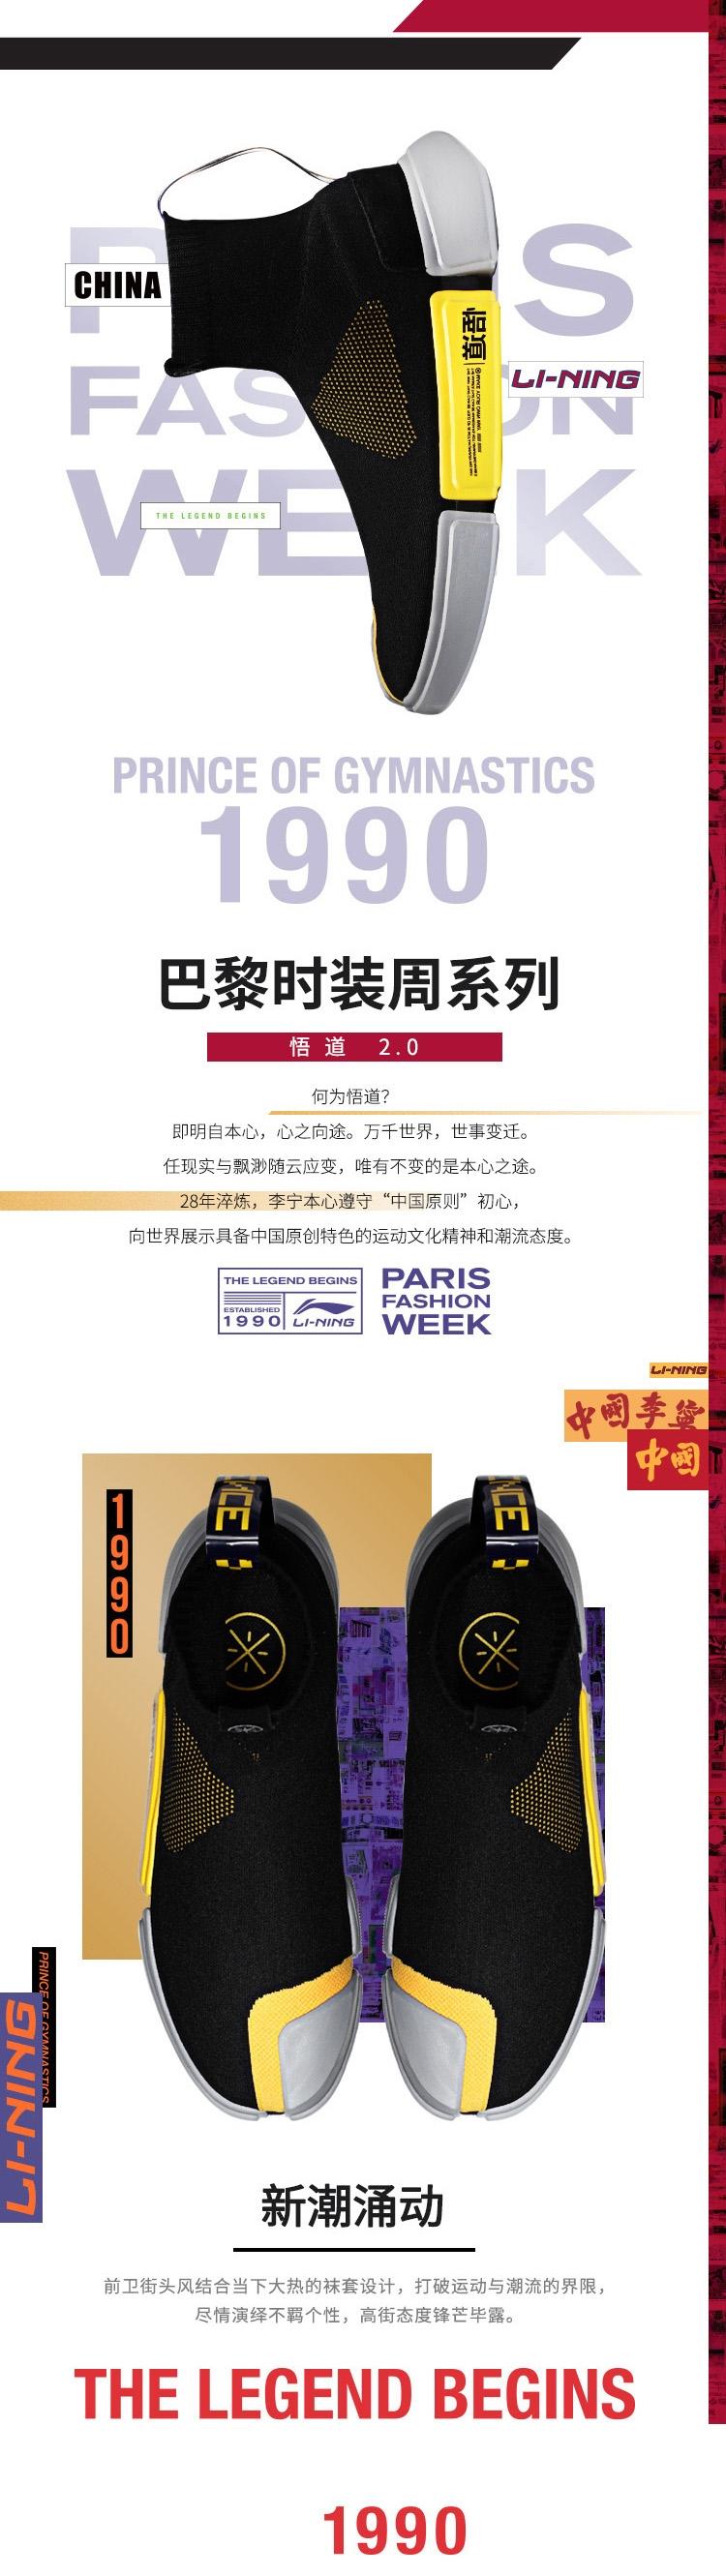 Li-Ning Paris Fashion Week Essence 2.0 Men's casual Sneakers